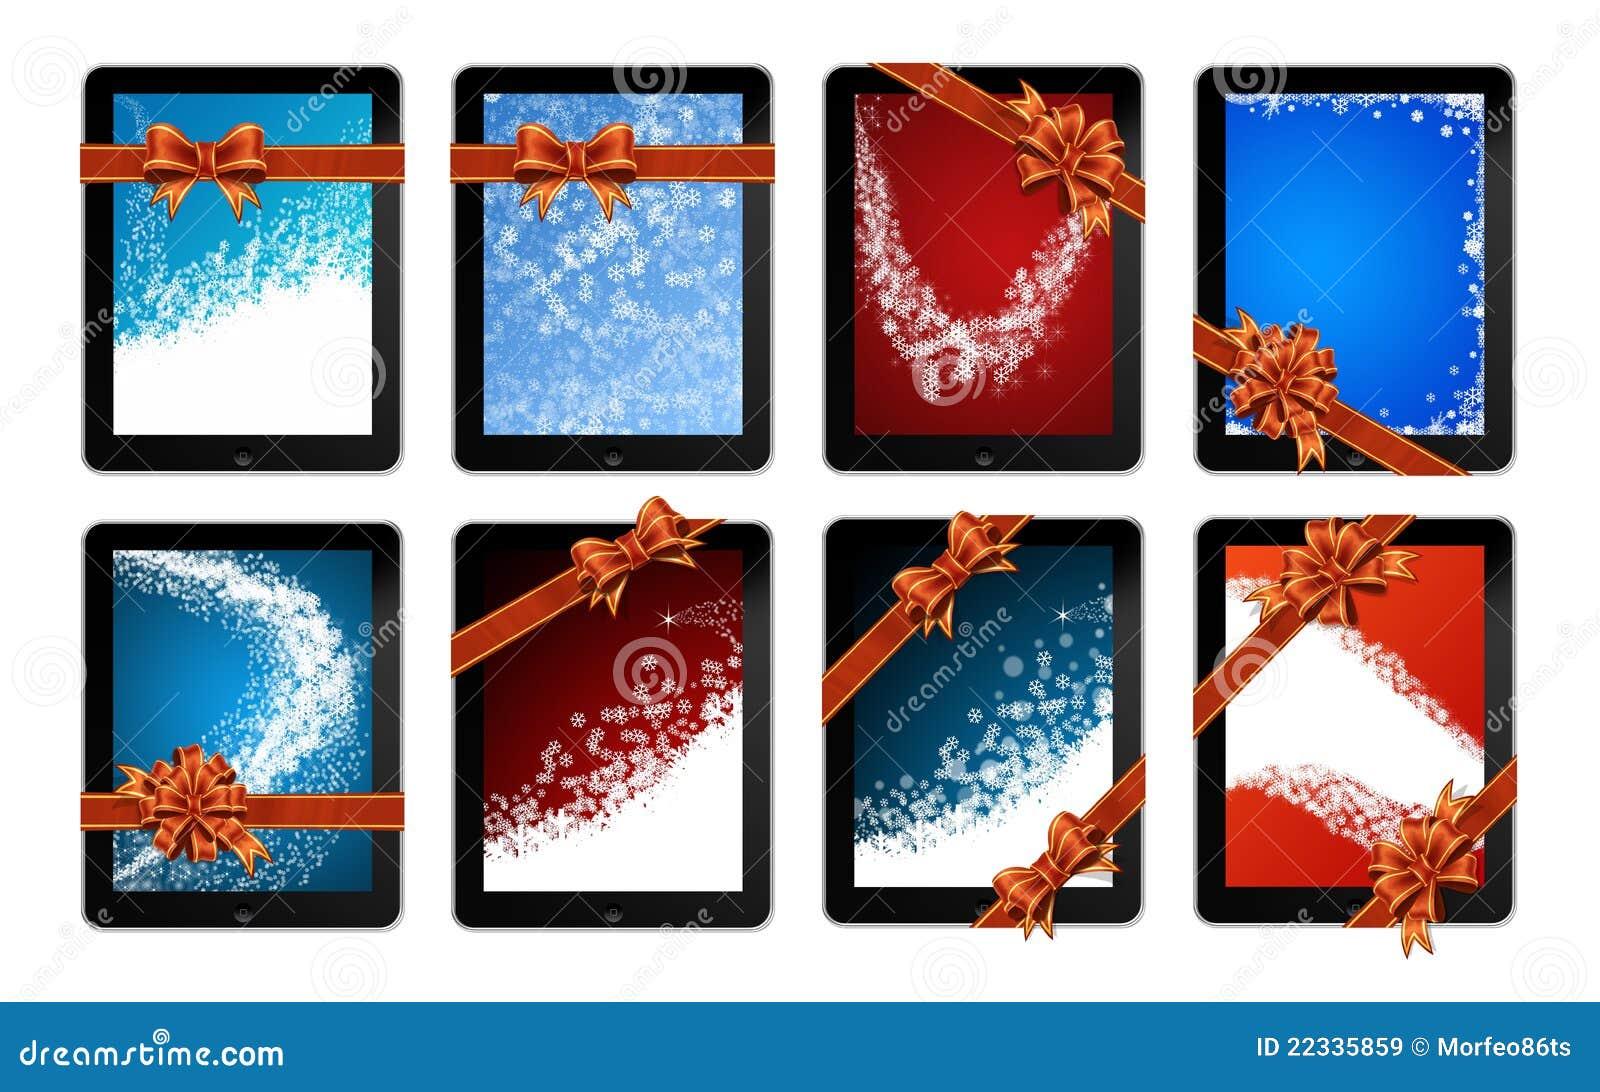 Gift Apple Ipad 2 Editorial Stock Image Image 22335859